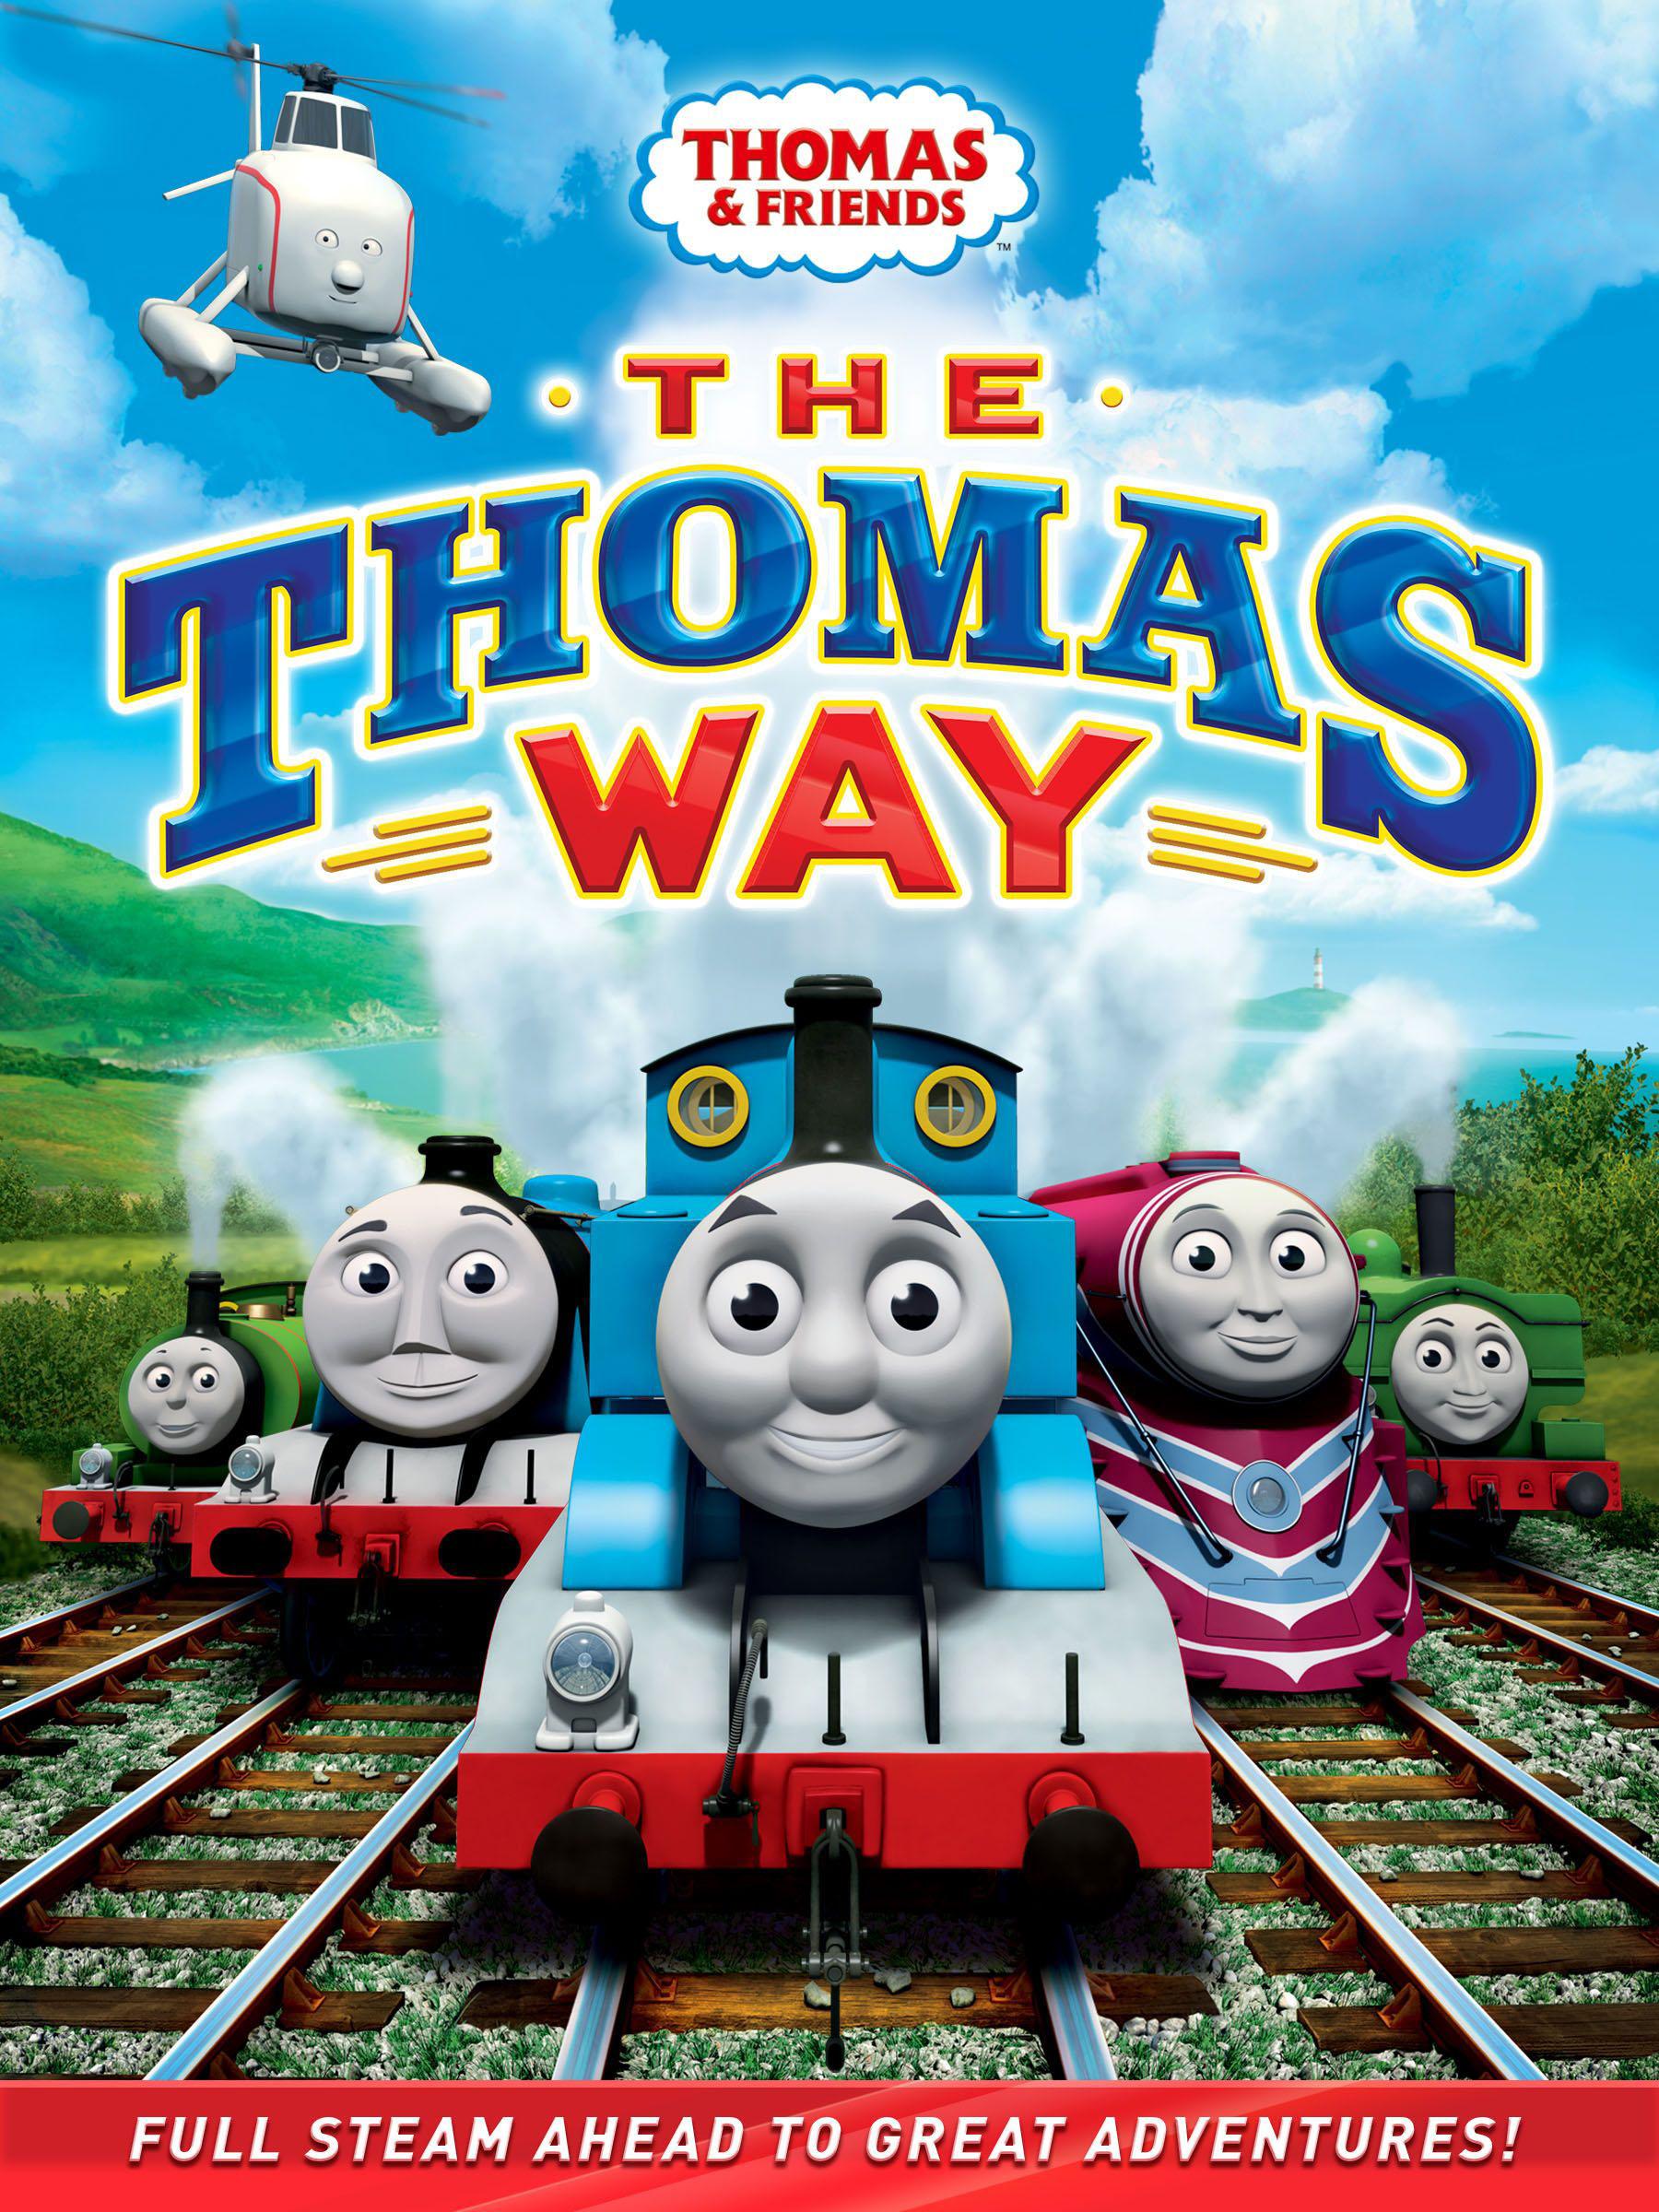 the thomas way dvd thomas the tank engine wikia fandom powered